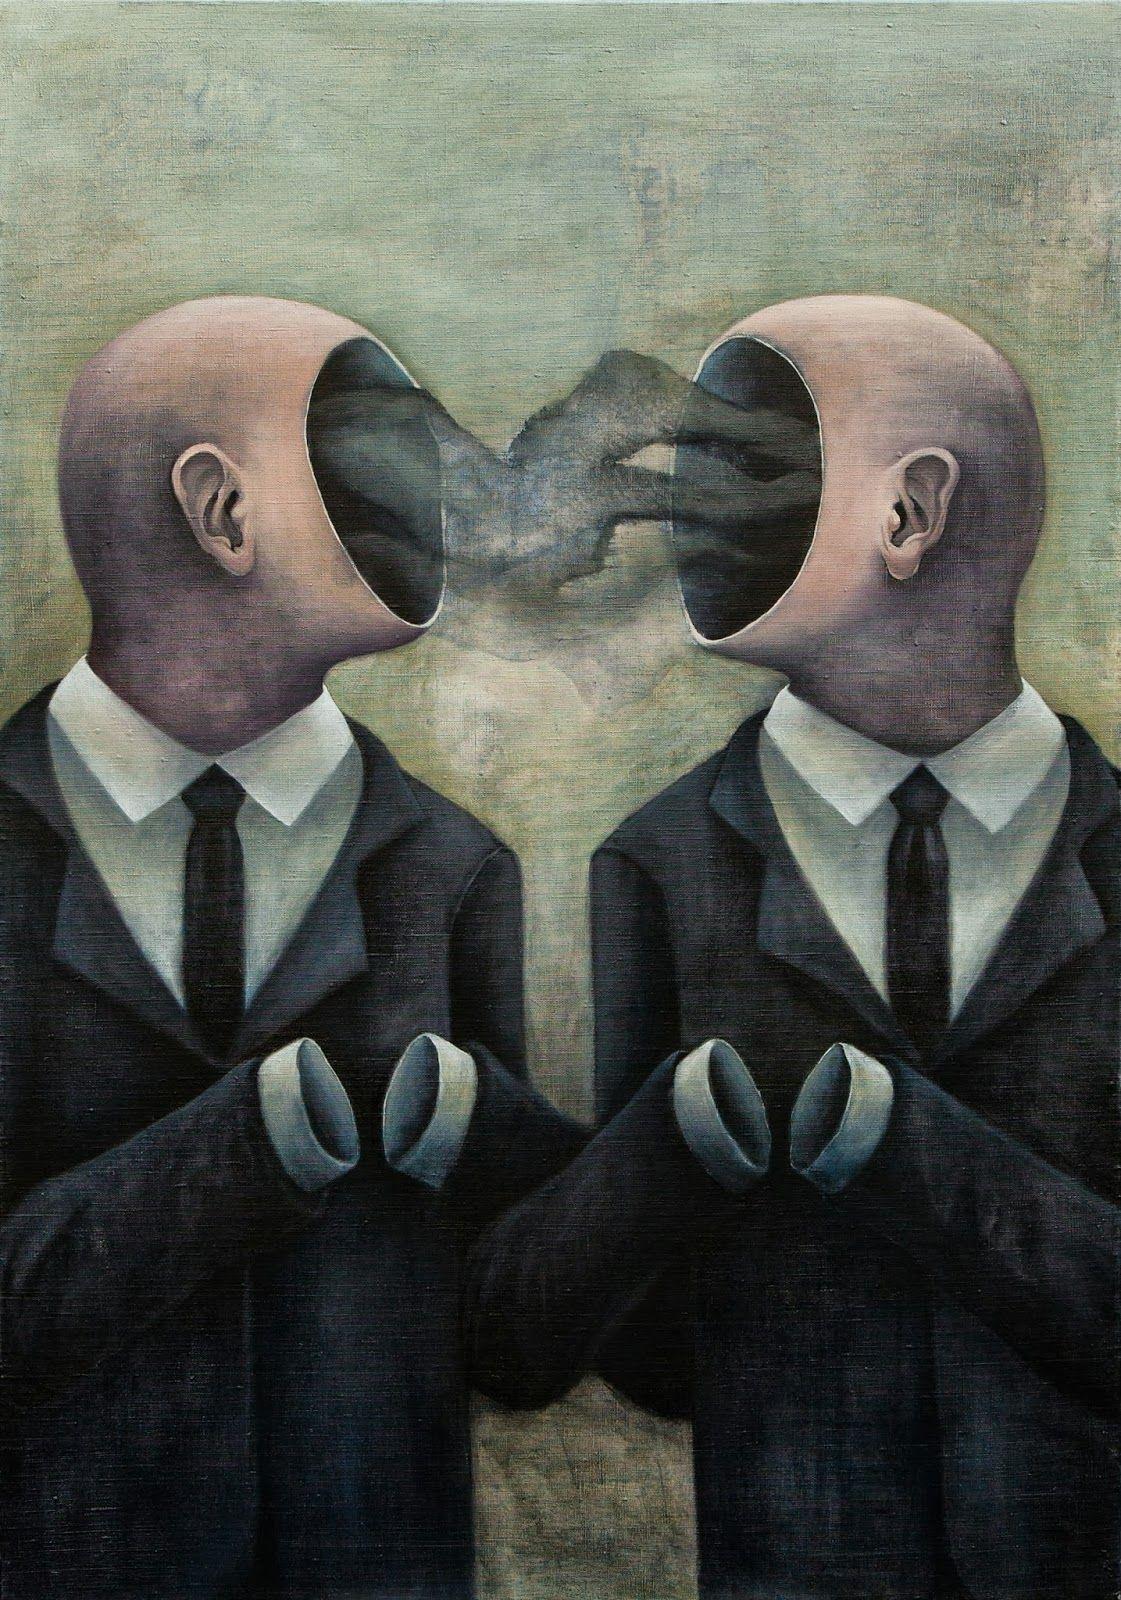 N A D J A J O V A N O V I C Surealism Art Surreal Art Painting Surrealism Painting